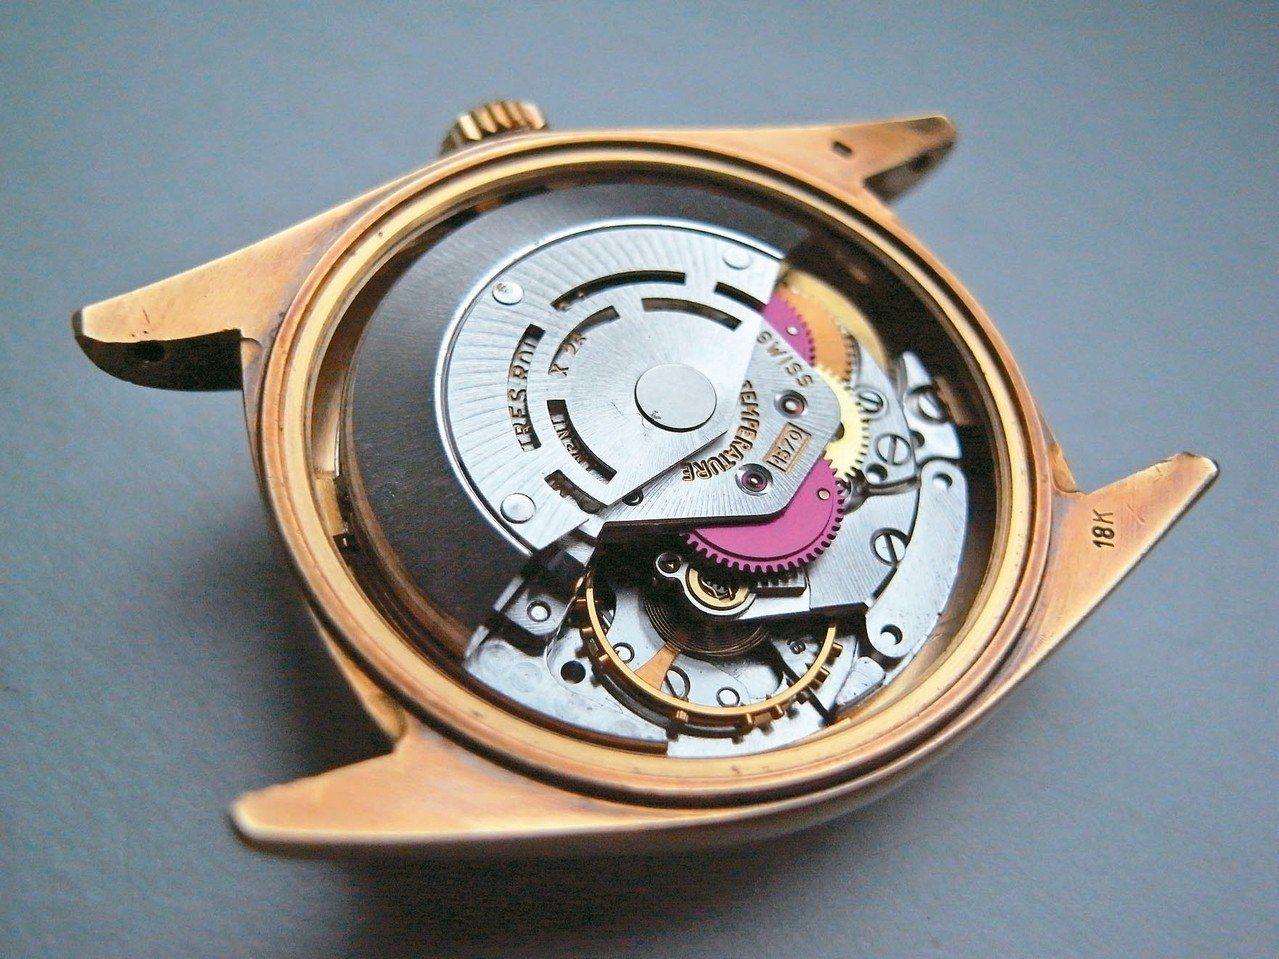 Rolex 1570被譽為全球三大最佳機芯。 圖/曾士昕提供